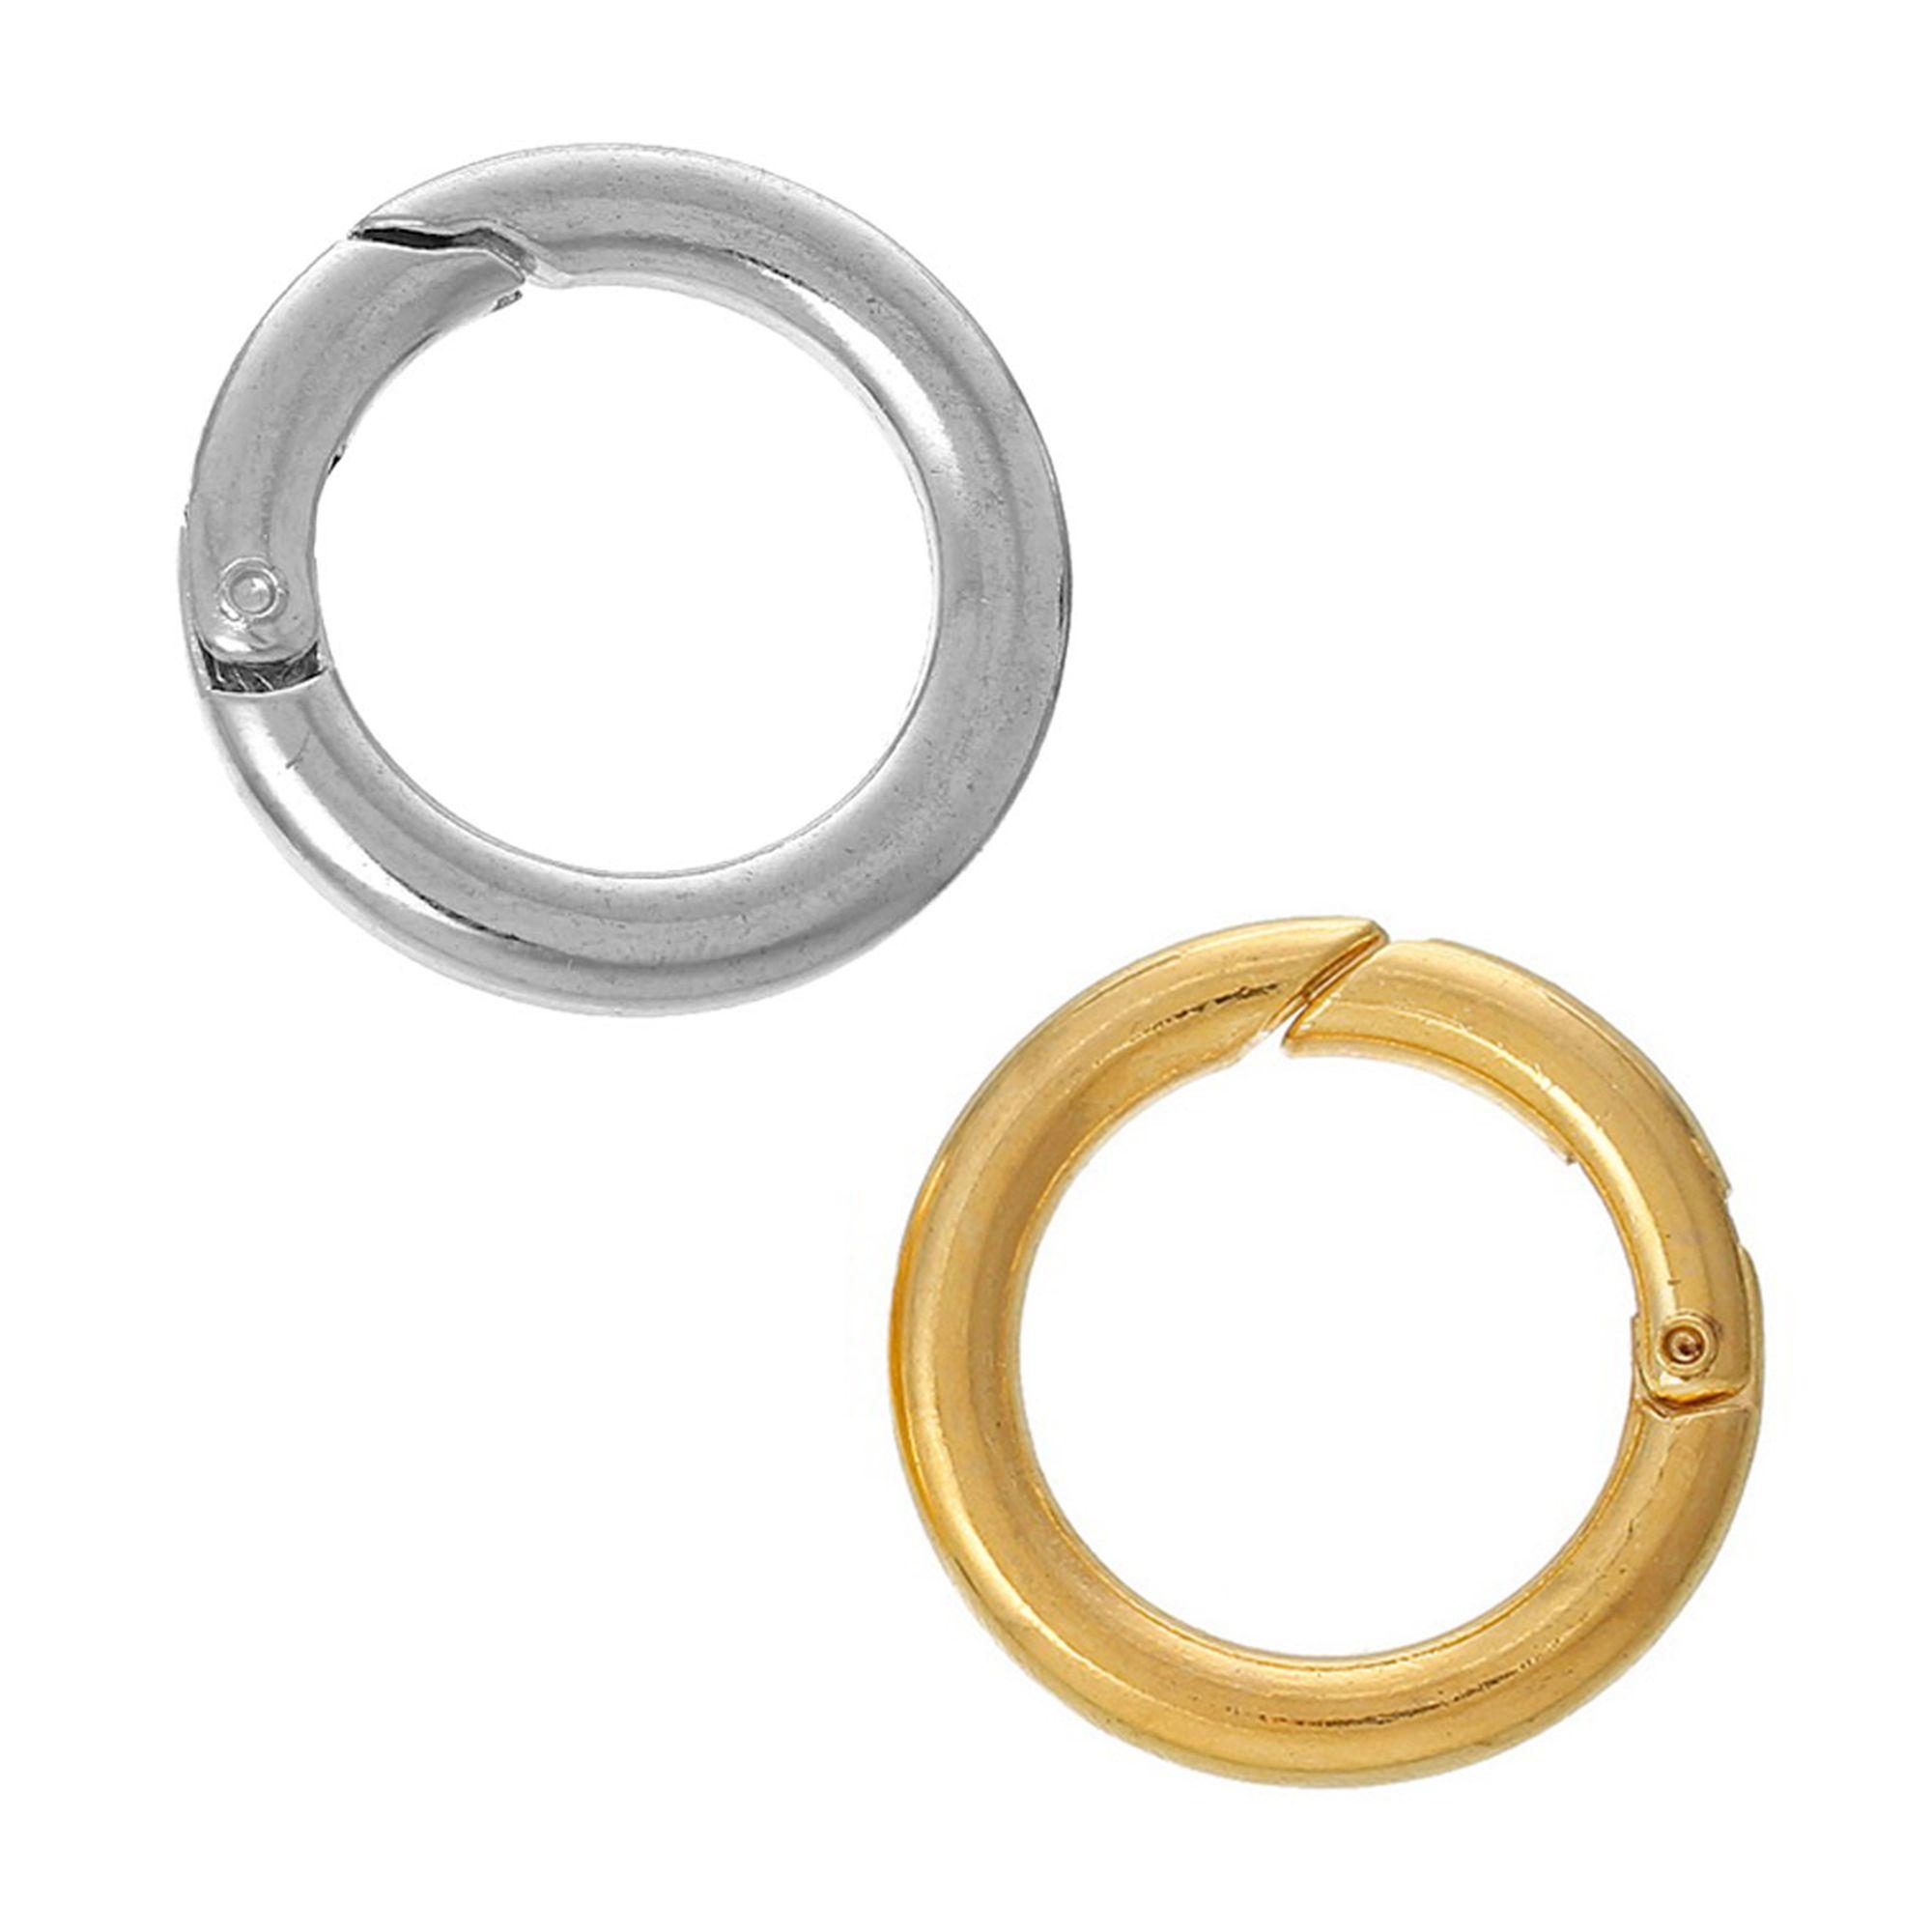 5 Sicherheitsringe 25mm silber gold Karabiner Ringverschluss dick ...